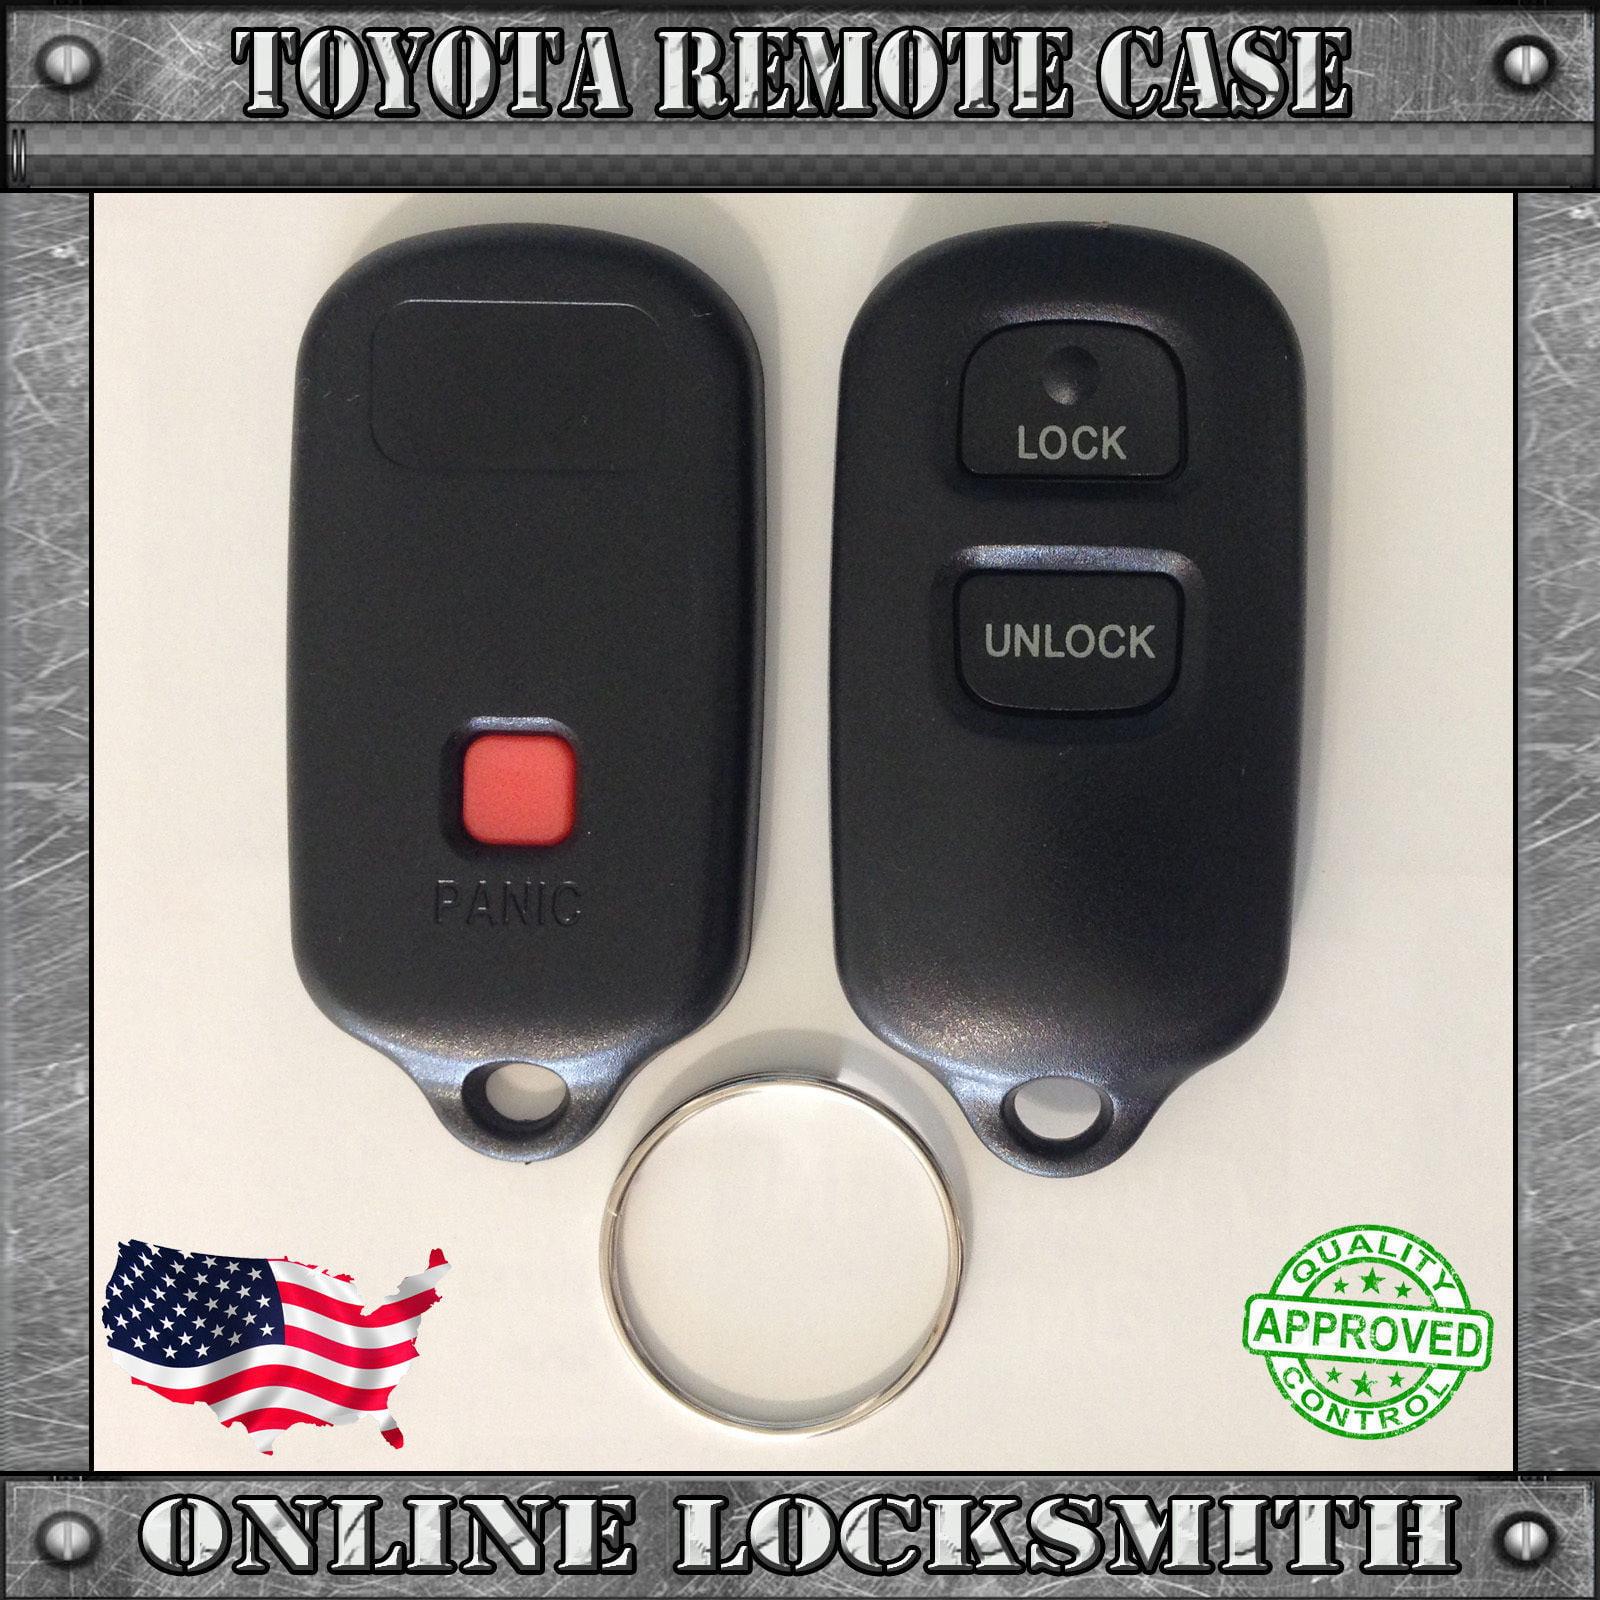 Remote Shell Keyless Entry Fob Case For Toyota FJ Cruiser 2006-2008 By Ri-Key